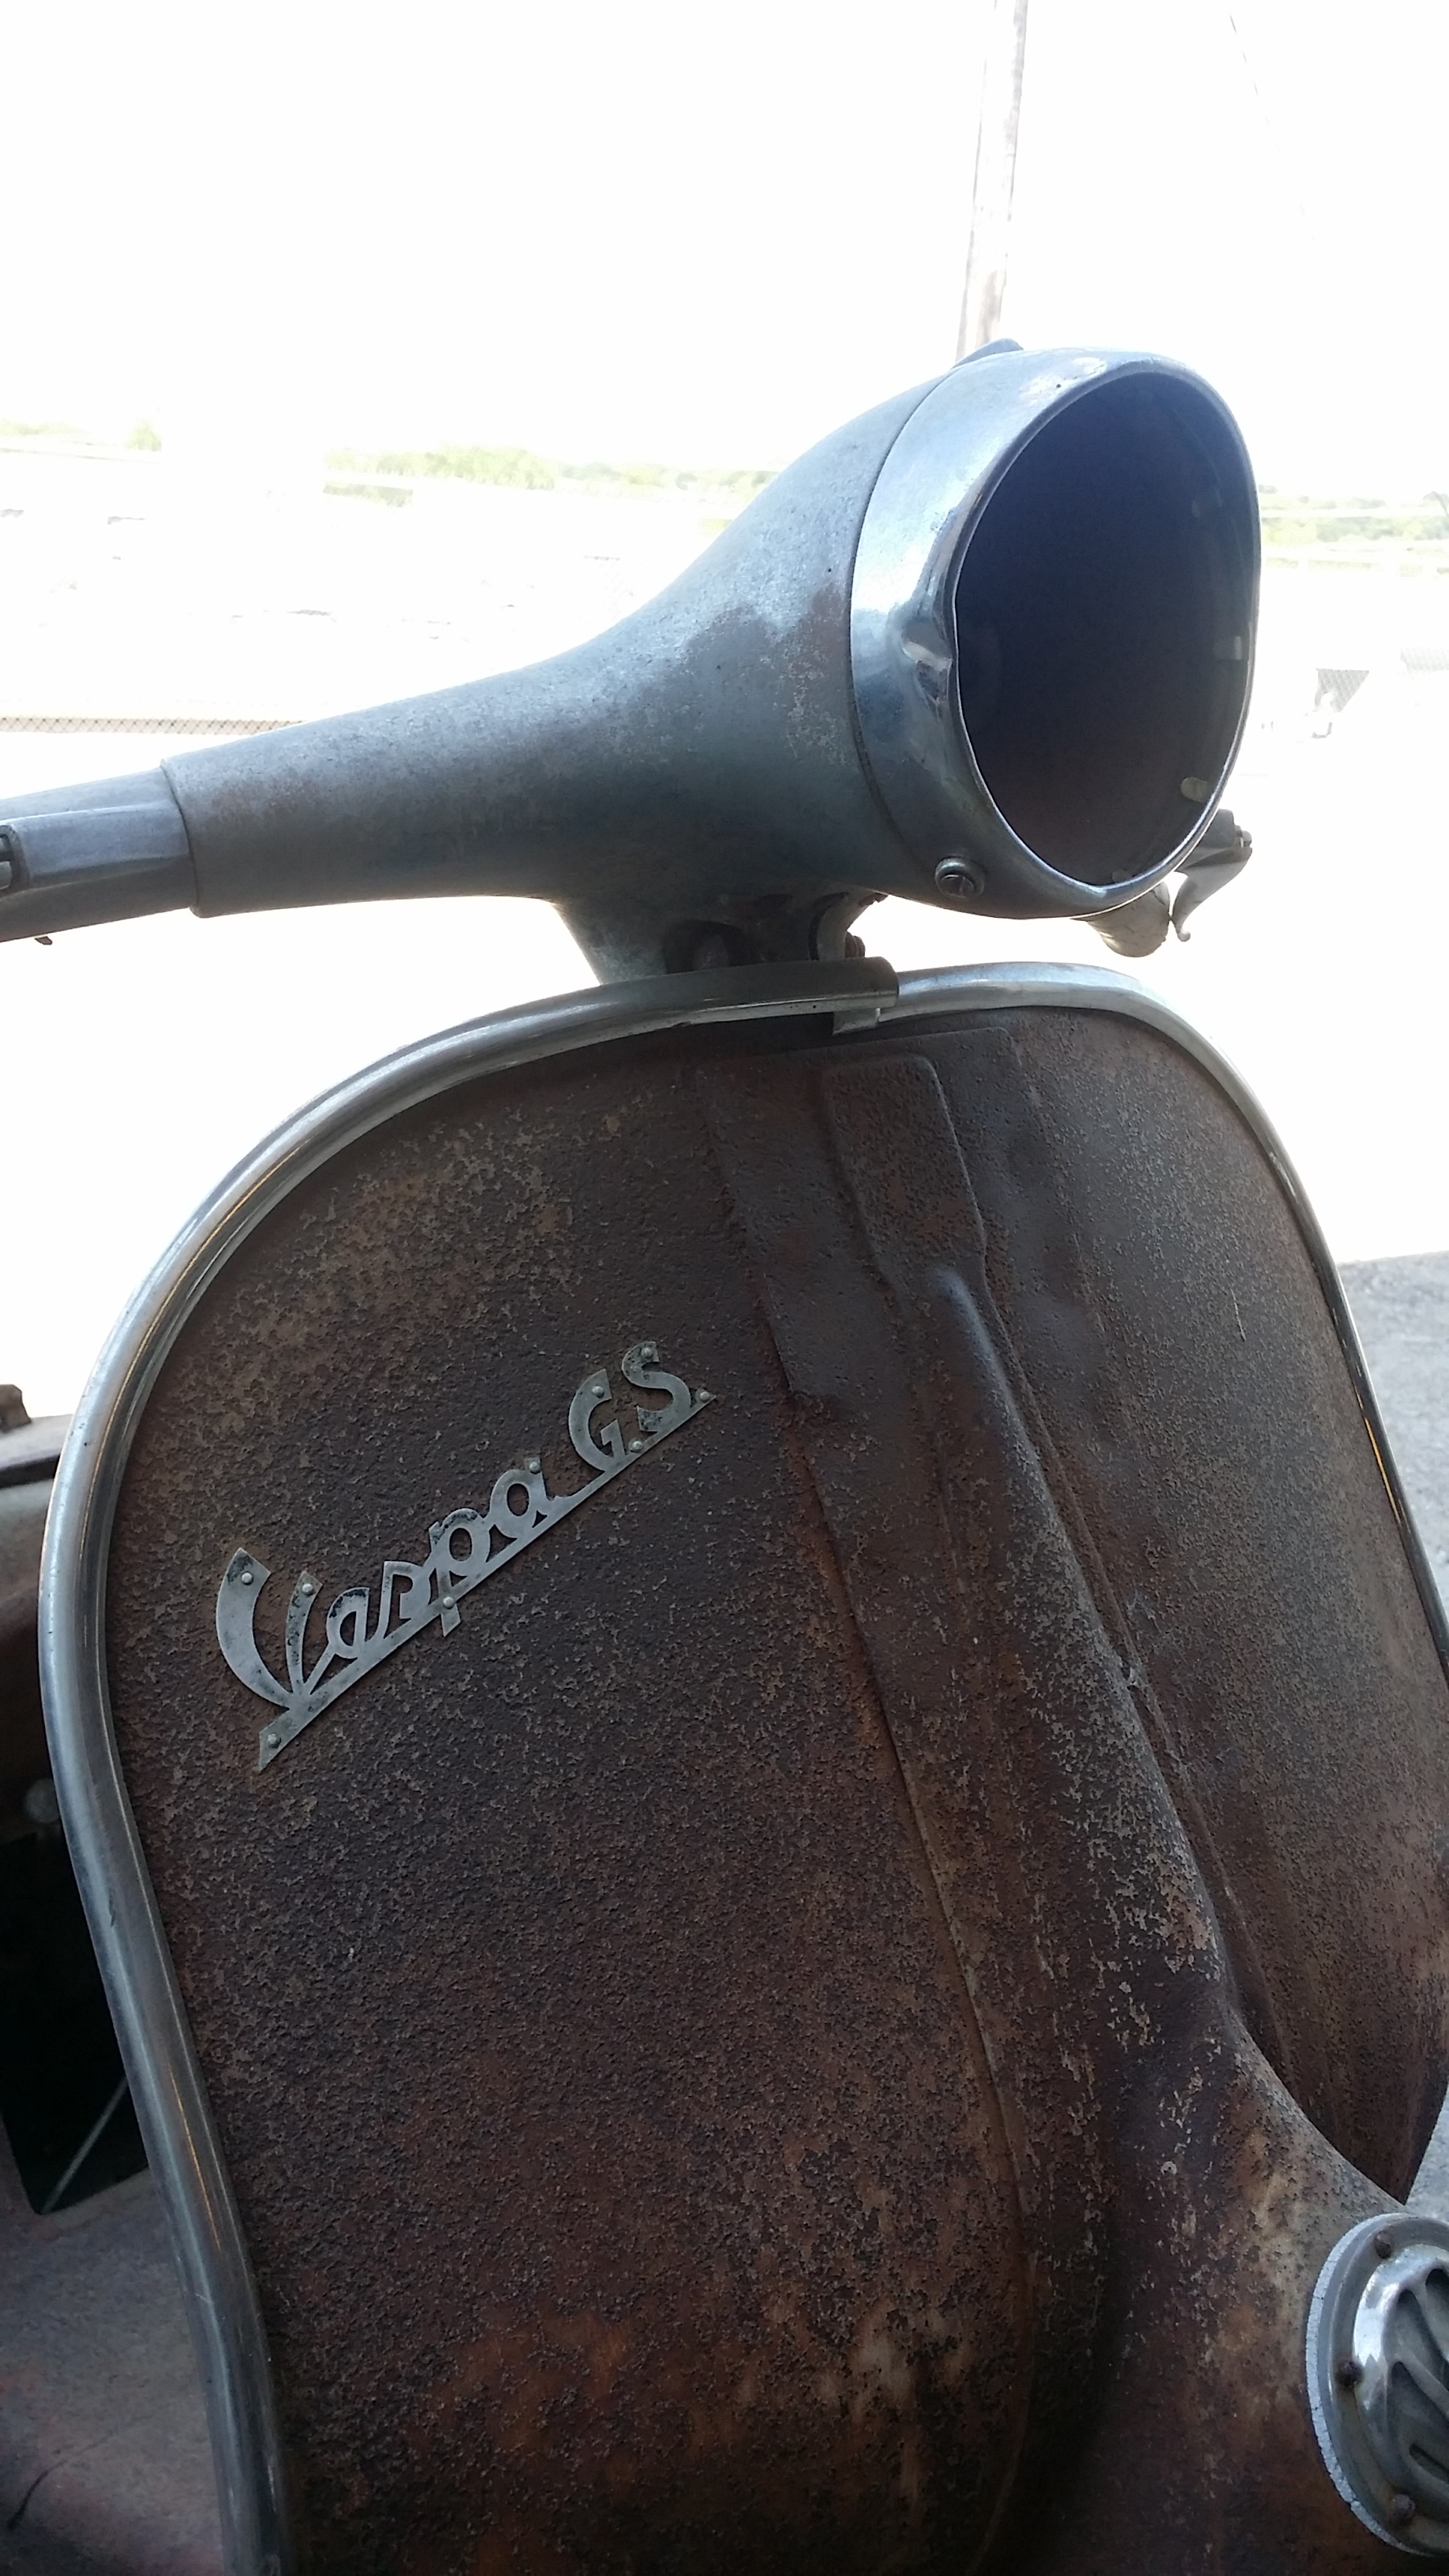 08-05-2016 vespa 1950 Vespa GS150 forney (6).jpg